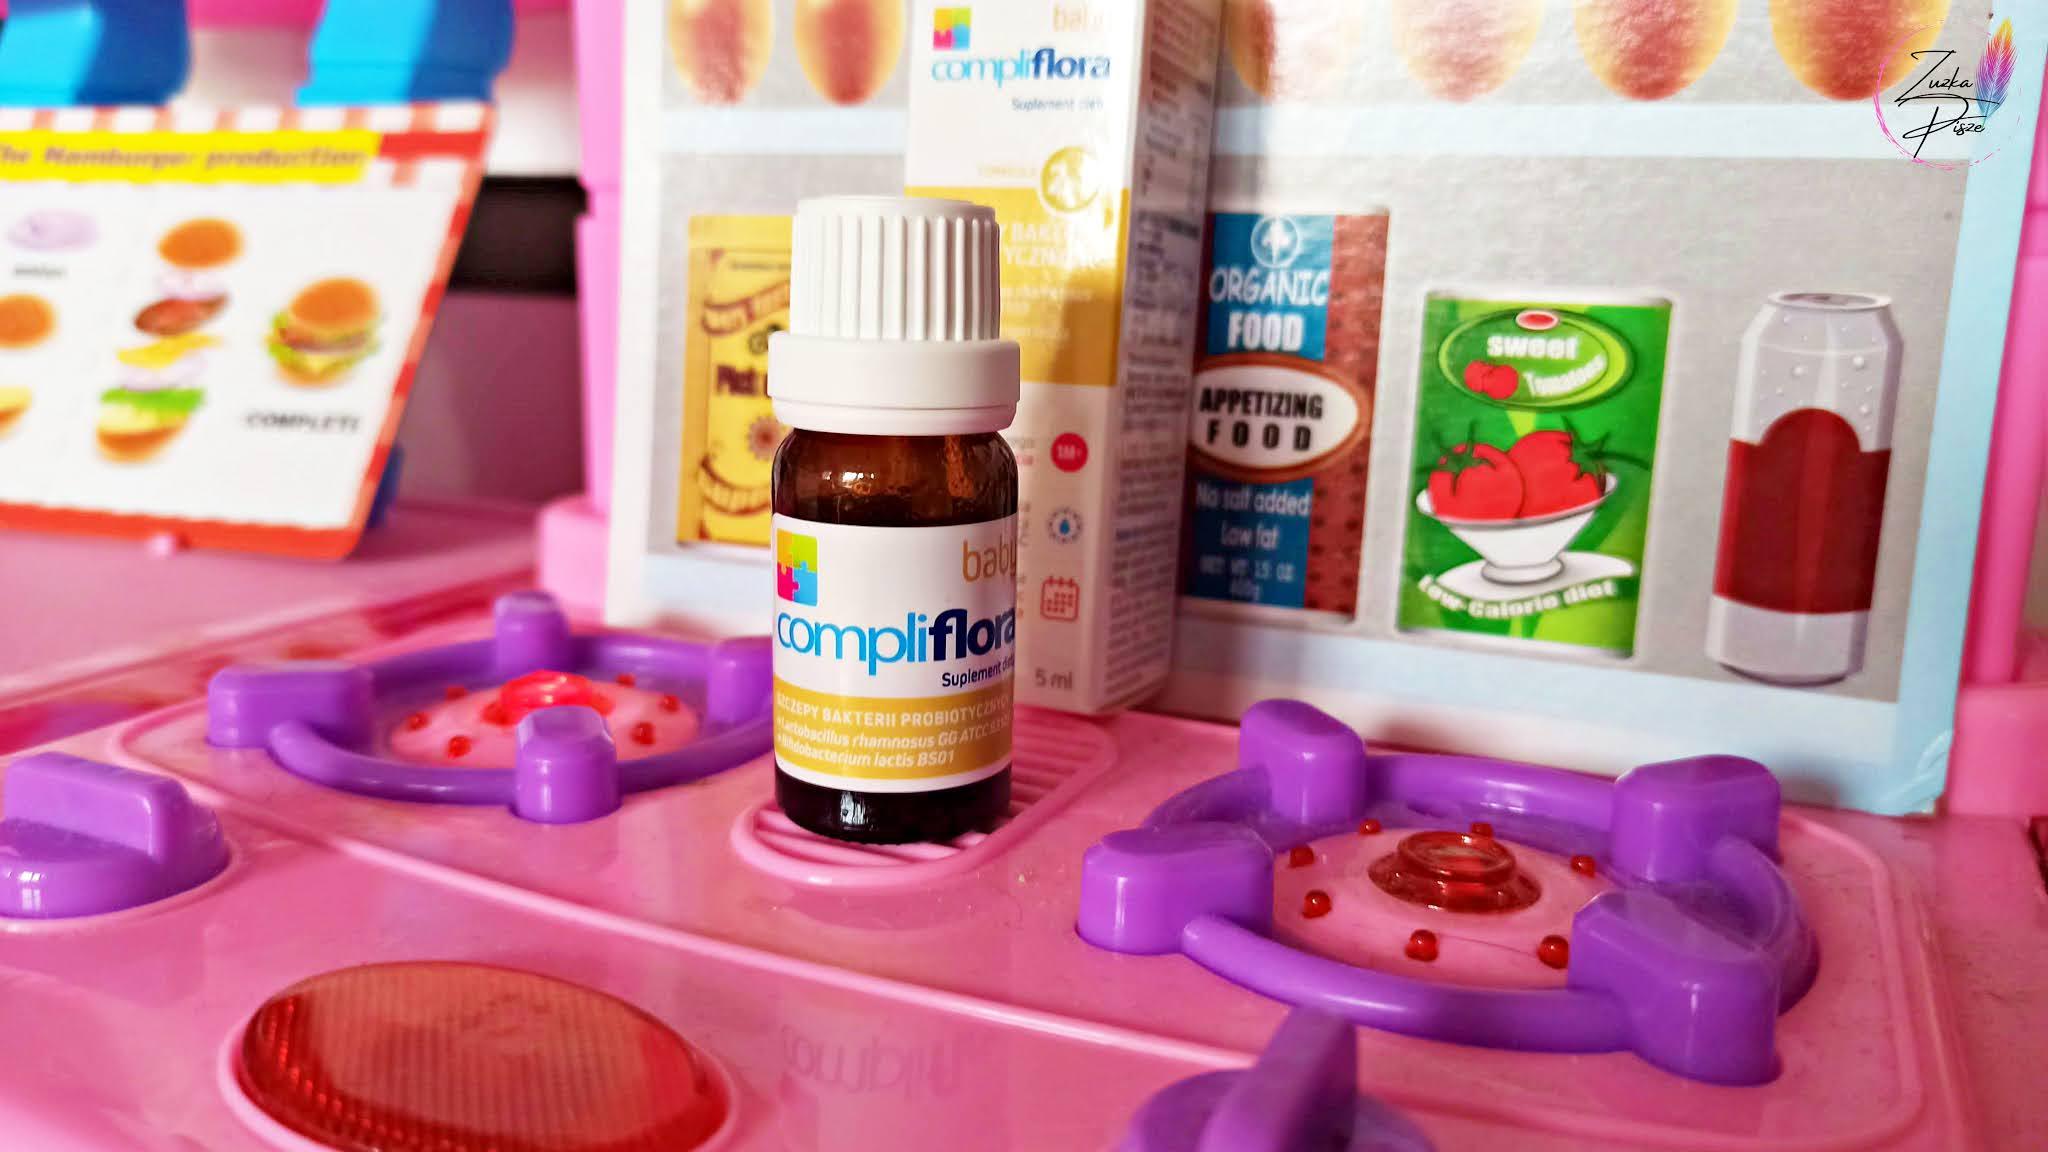 Compliflora baby - zdrowie w kilku kropelkach